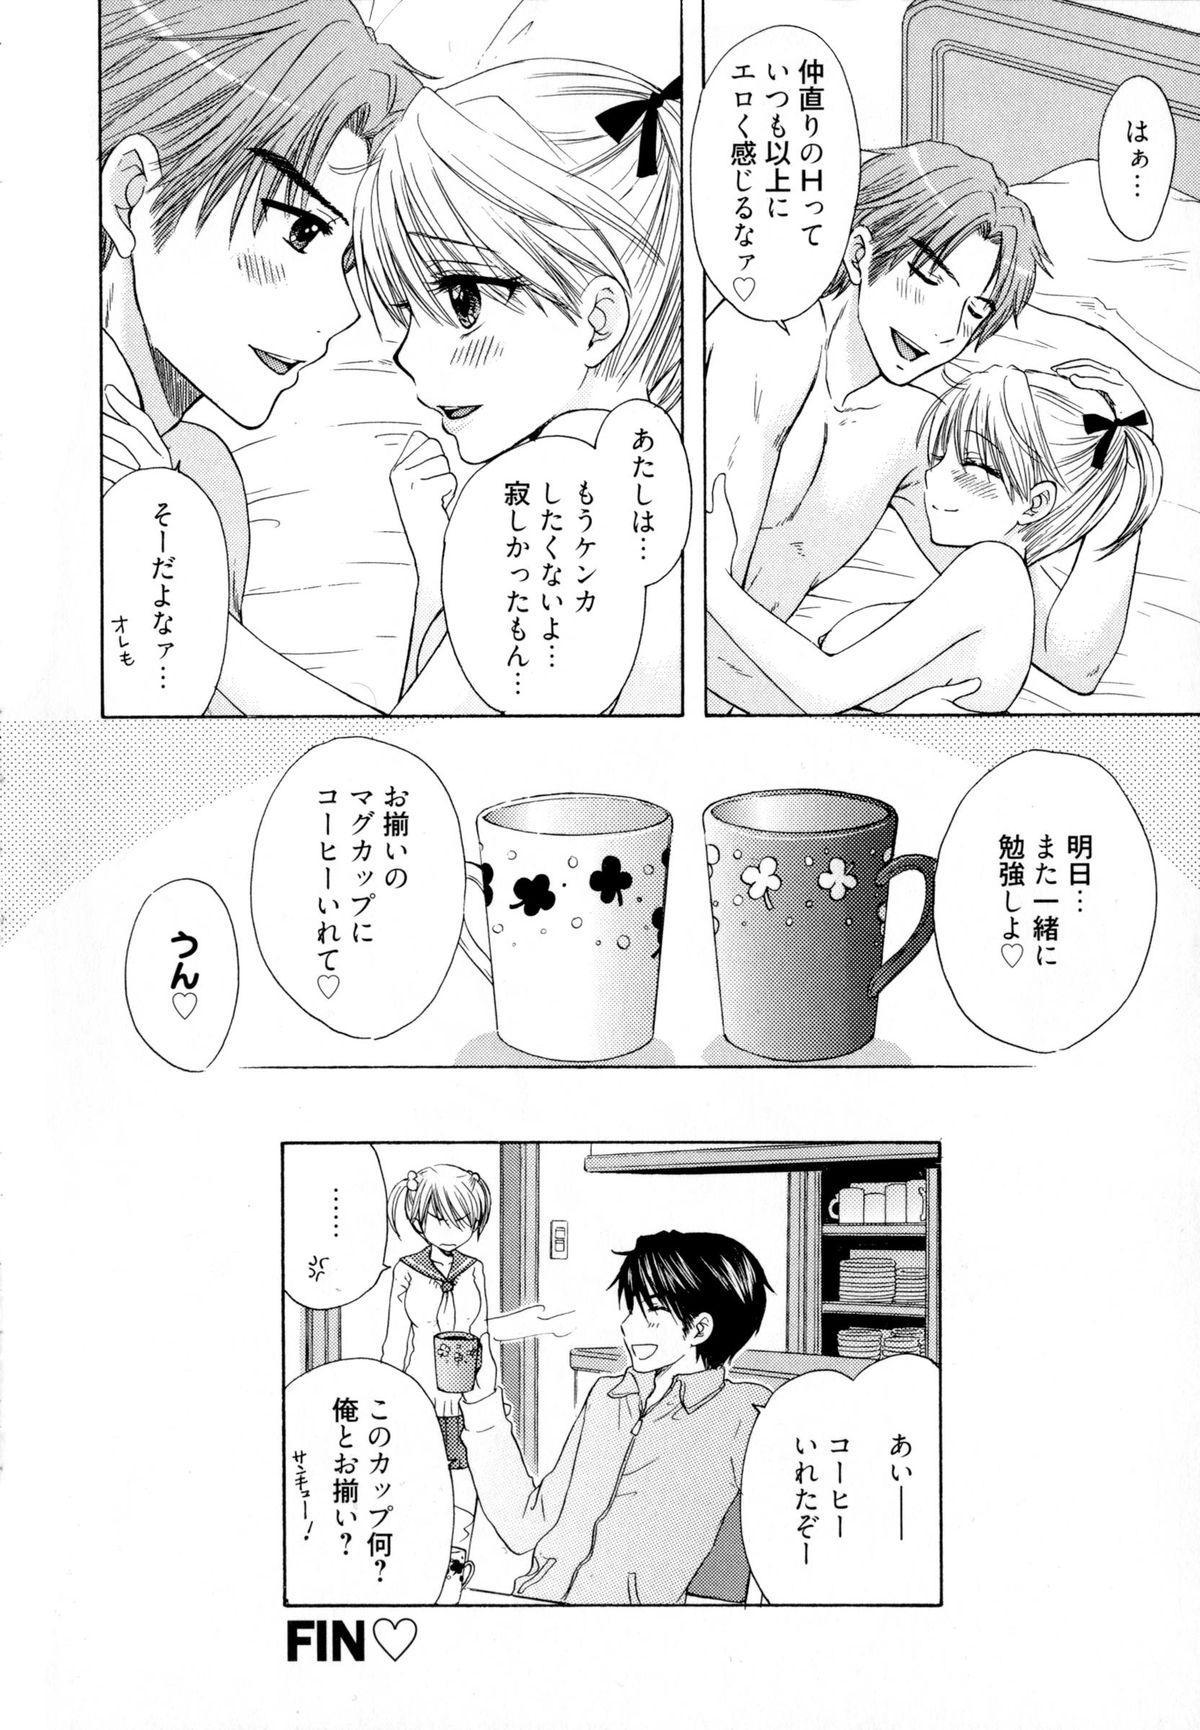 The Great Escape 4 Shokai Genteiban 103